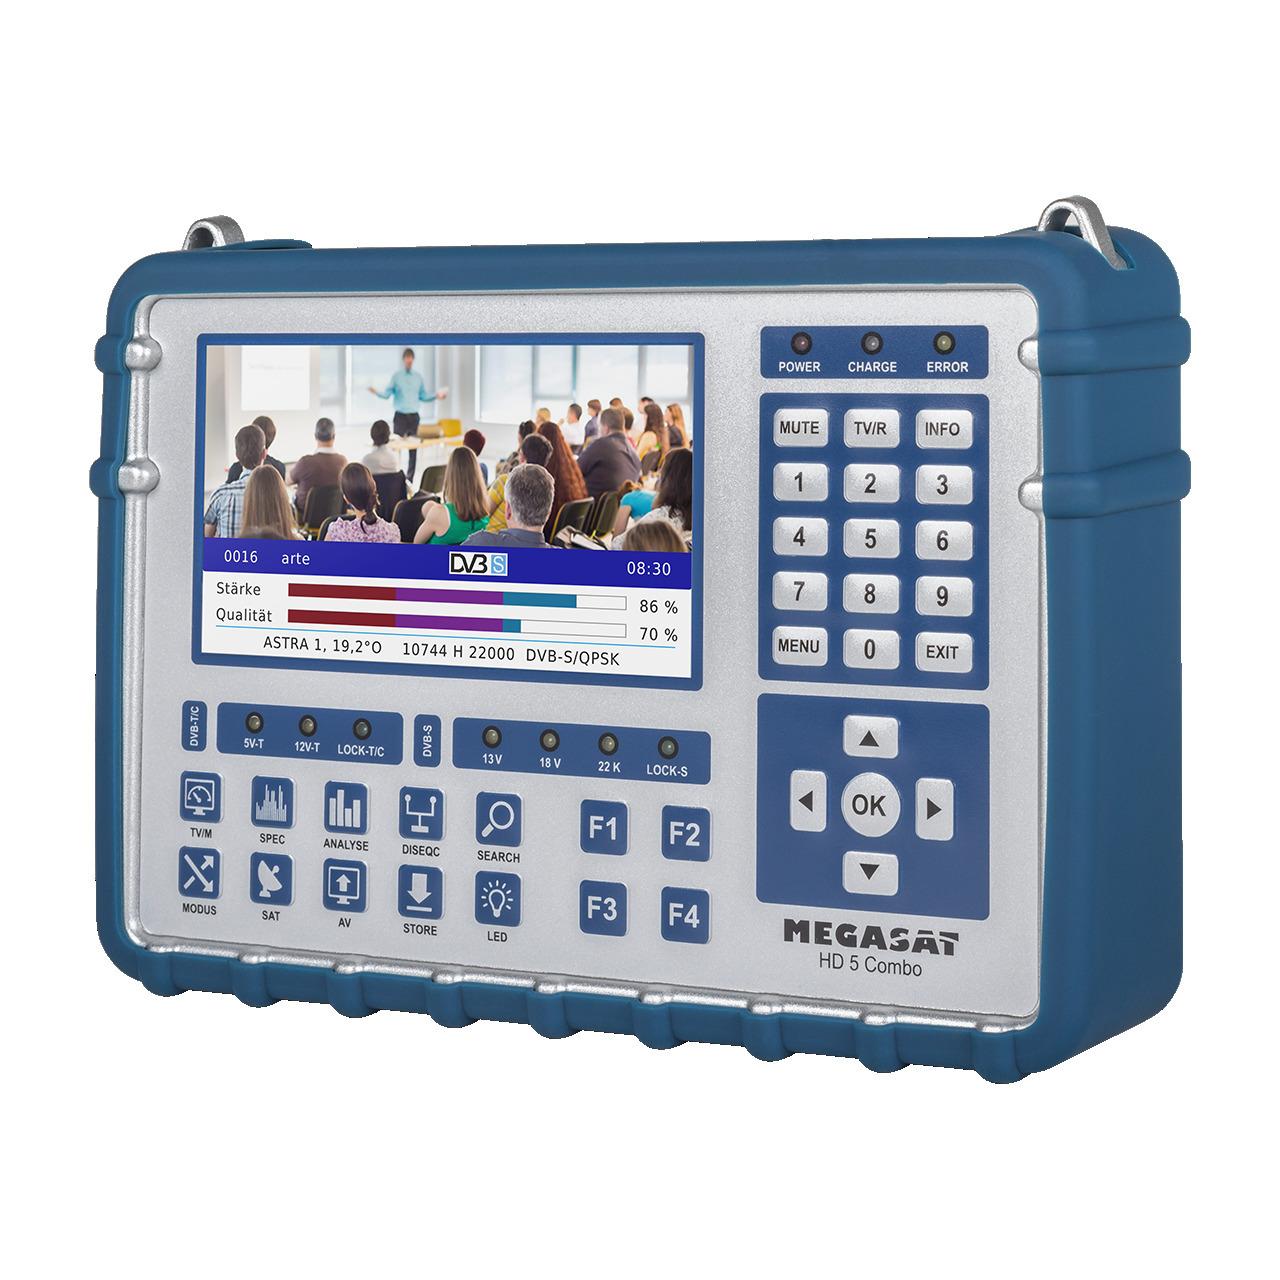 Megasat Sat-Messgerät HD 5 Combo- für DVB-S-S2-S2X- DVB-T-T2- DVB-C-C2- Live-TV-Modus